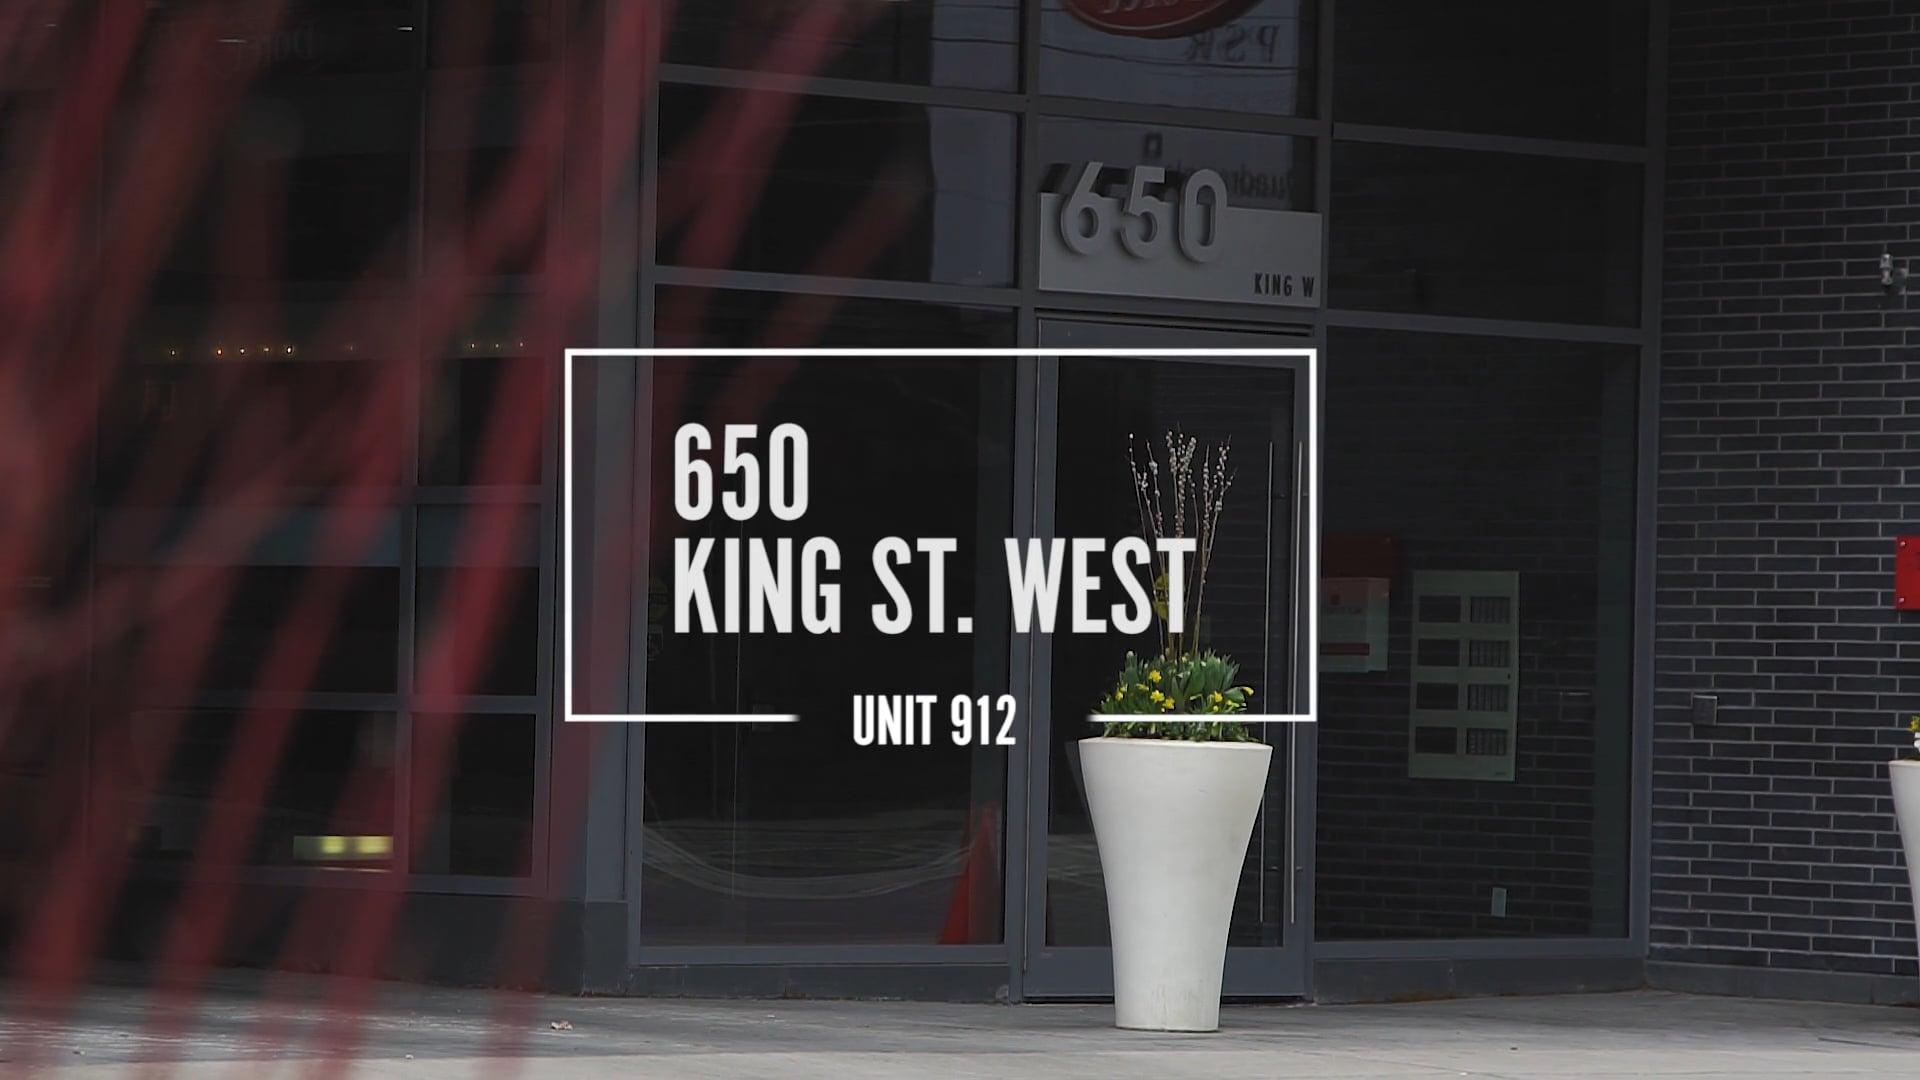 650 King St W 912